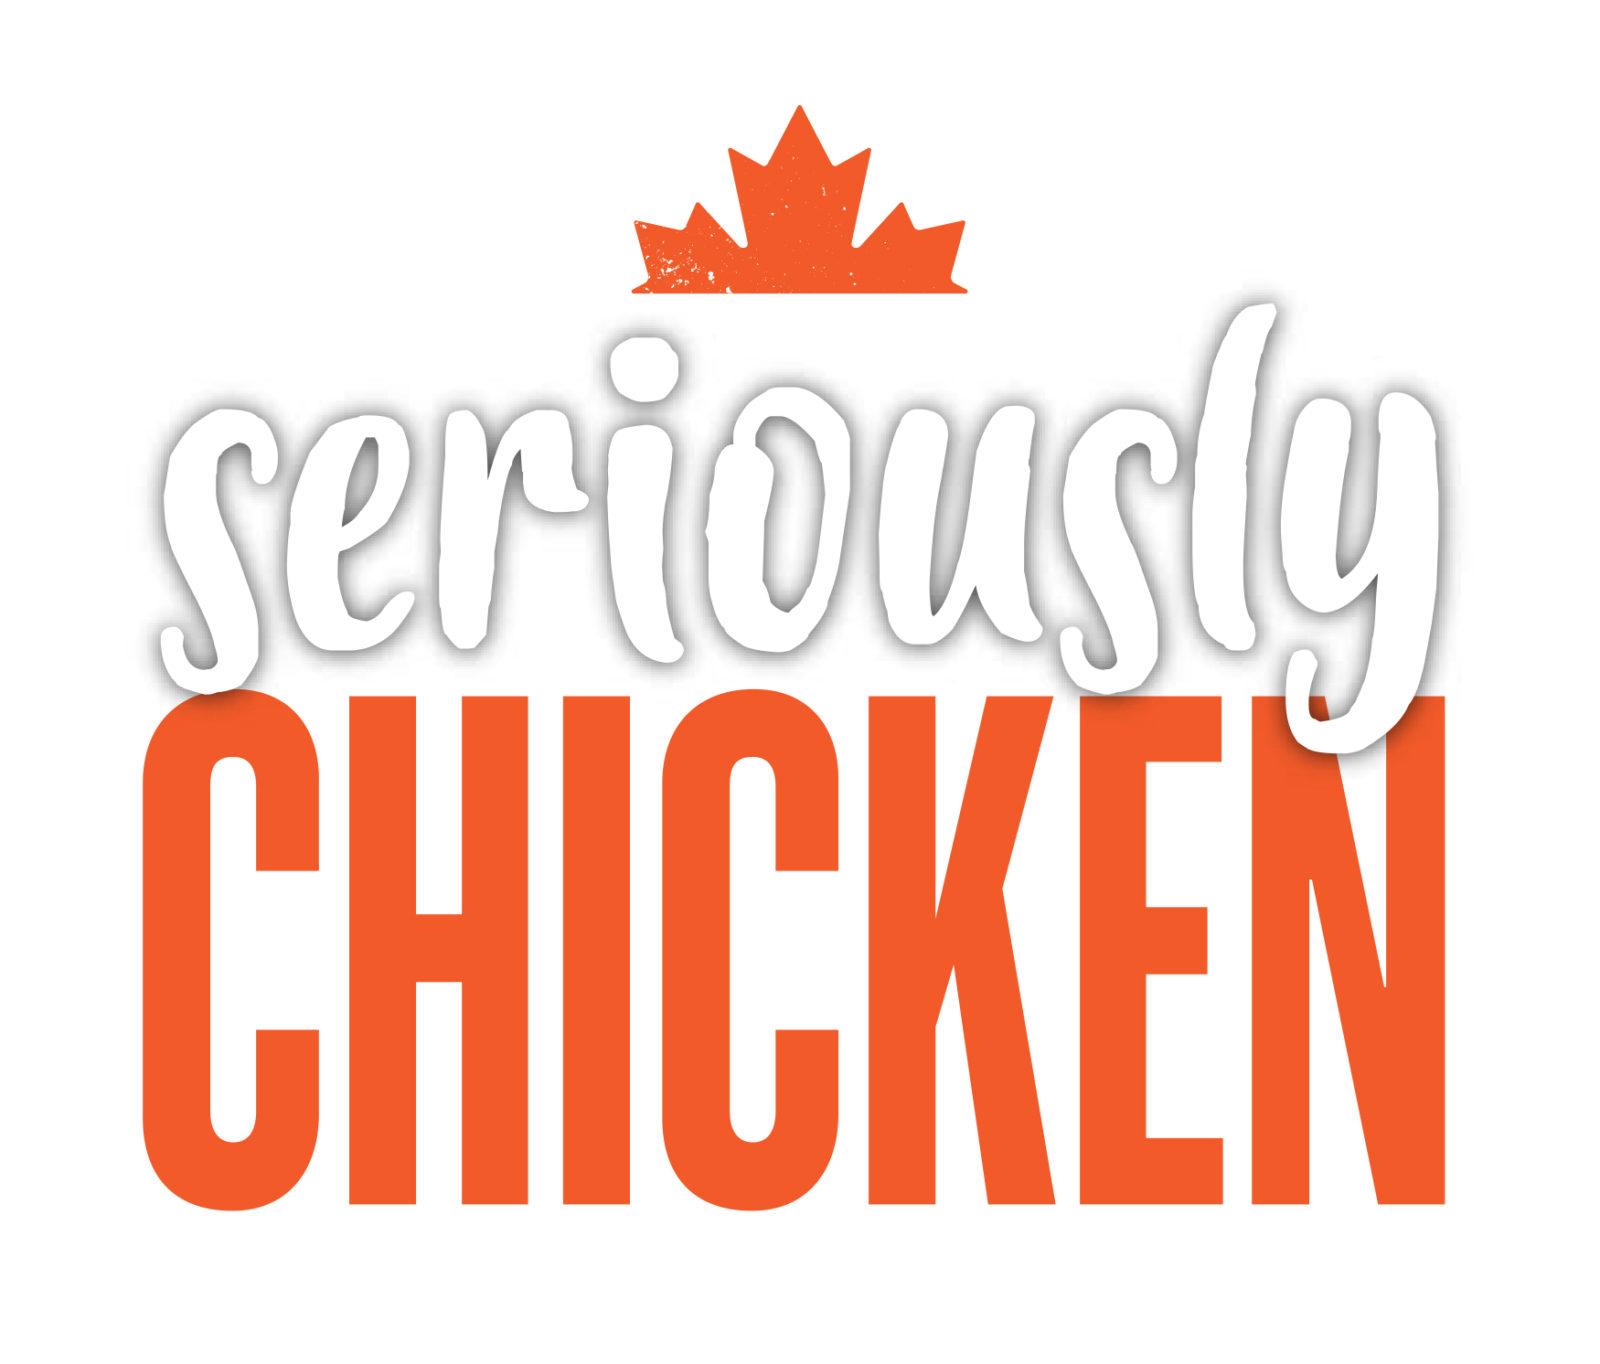 SeriouslyChicken_Logo_BIL